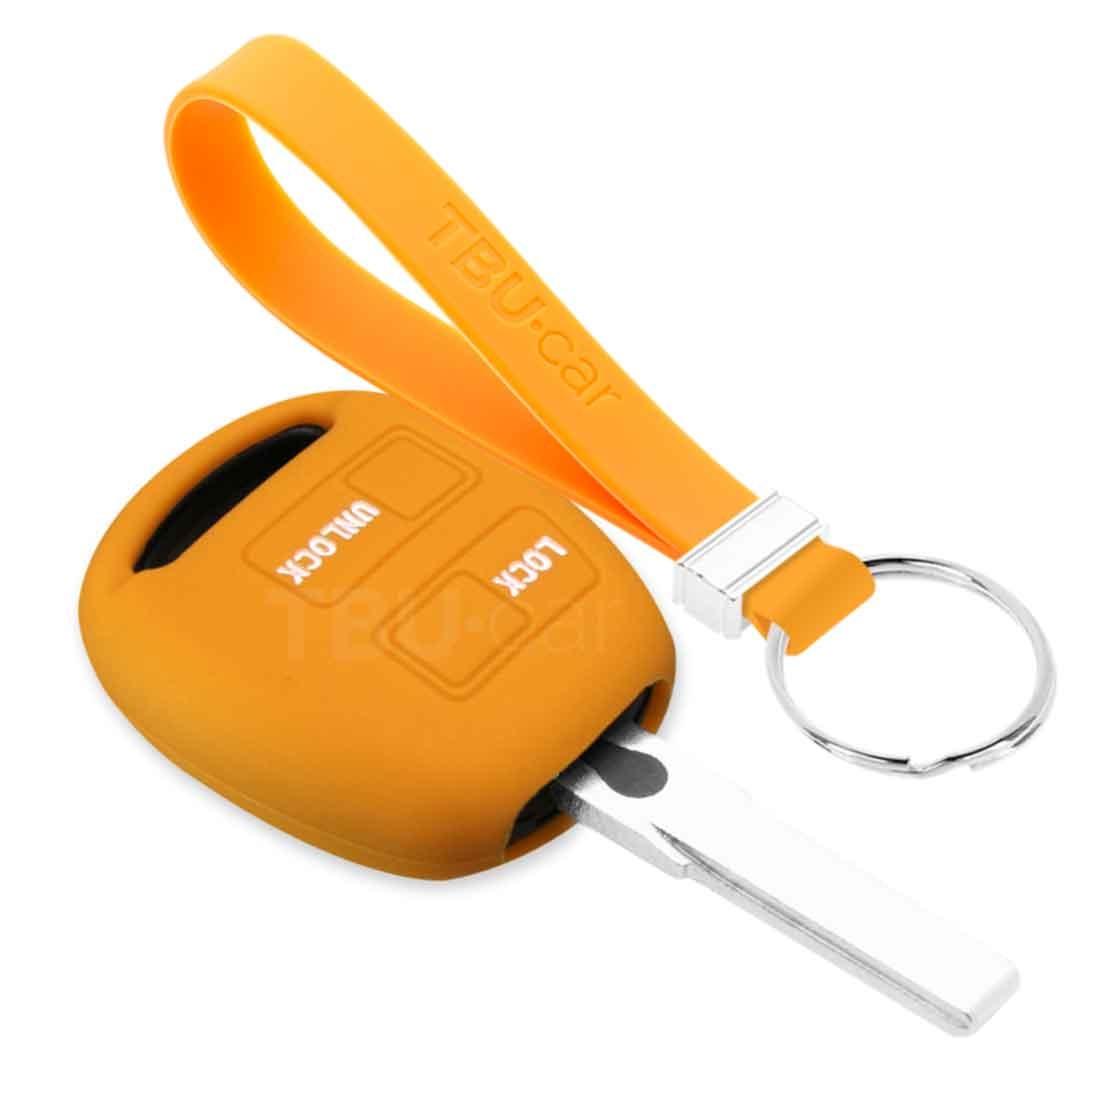 TBU car TBU car Autoschlüssel Hülle kompatibel mit Lexus 2 Tasten - Schutzhülle aus Silikon - Auto Schlüsselhülle Cover in Orange